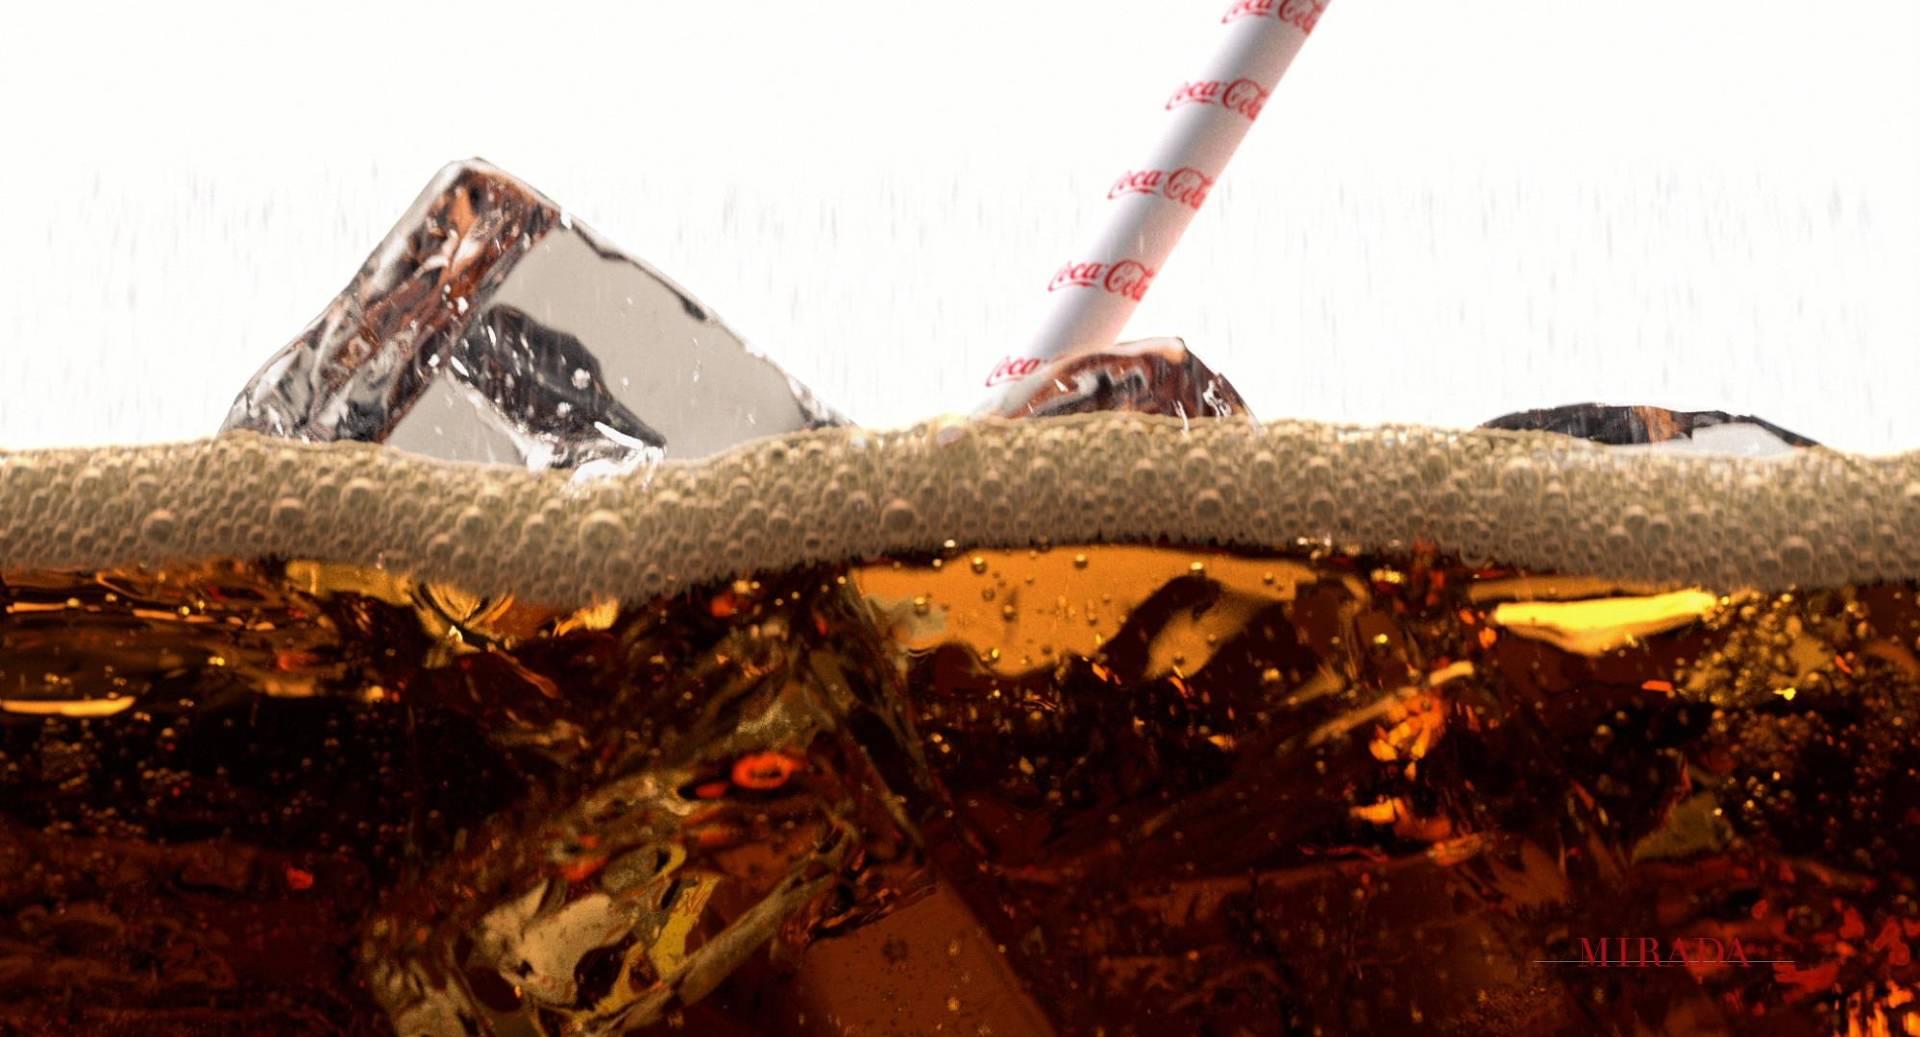 Coke_Carmichael.mov_008_960_2x.jpg